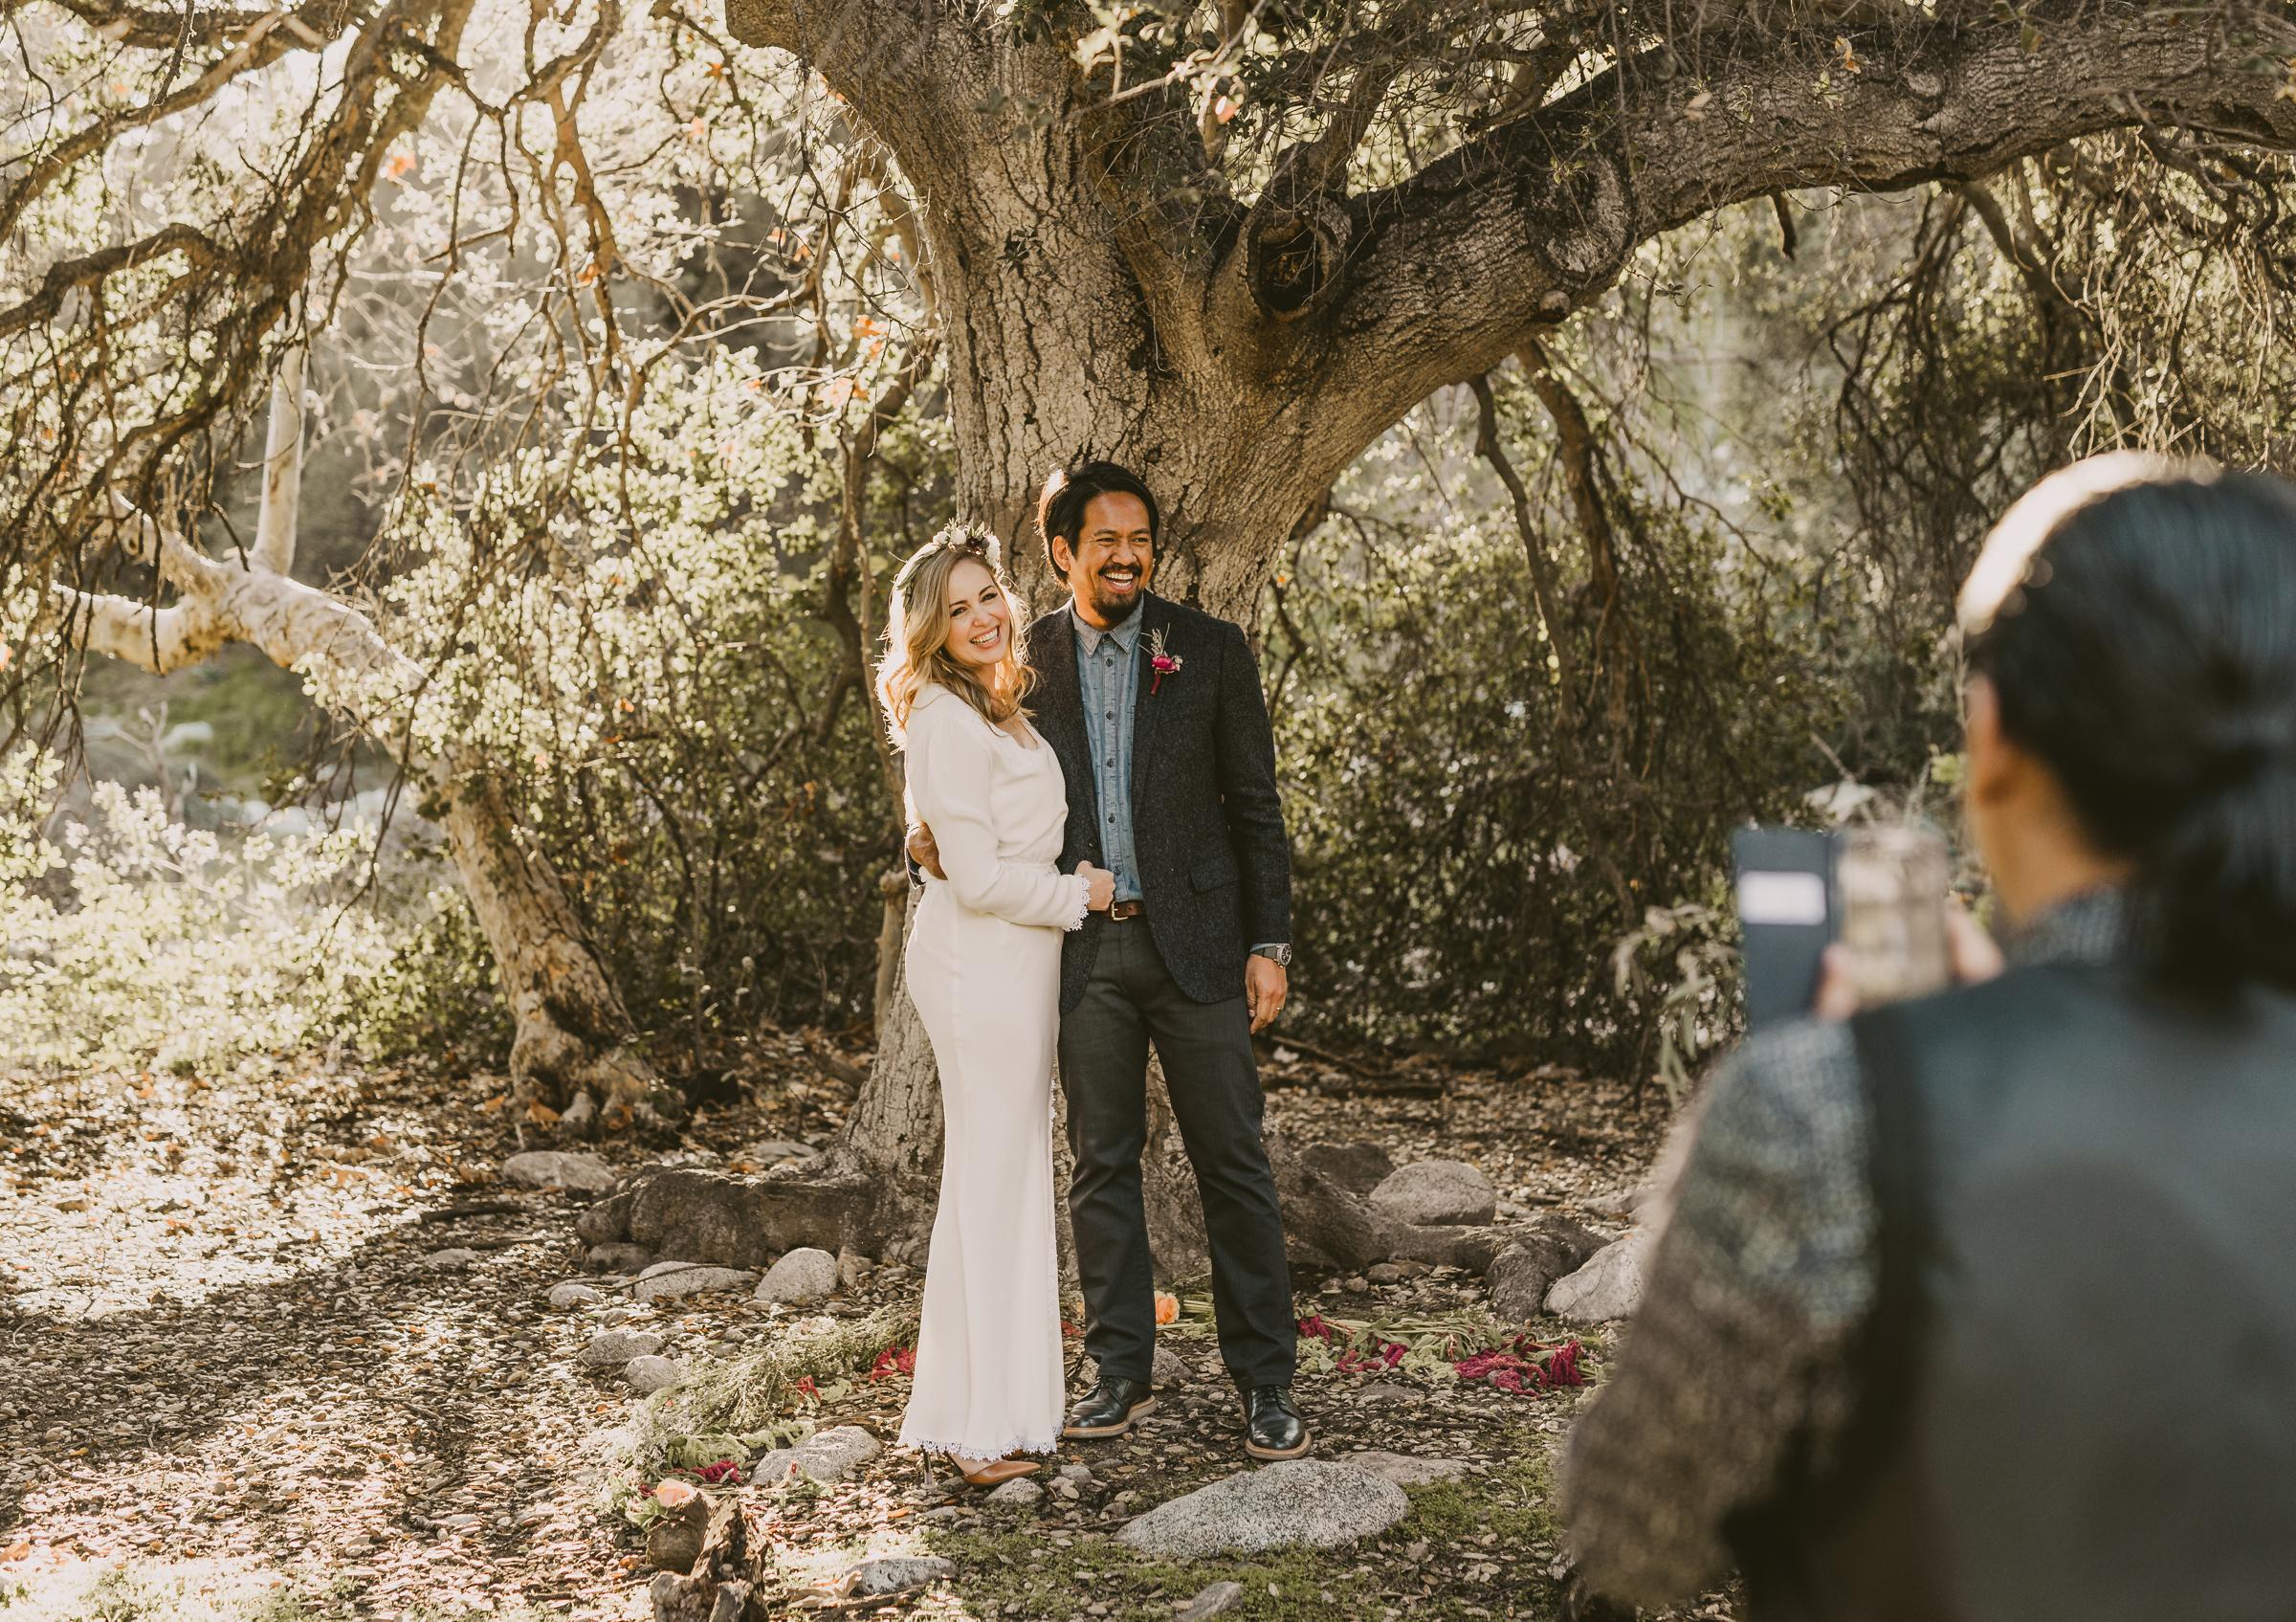 ©Isaiah + Taylor Photography - Intimate Elopement, Eaton Canyon, Los Angeles Wedding Photographer-38.jpg